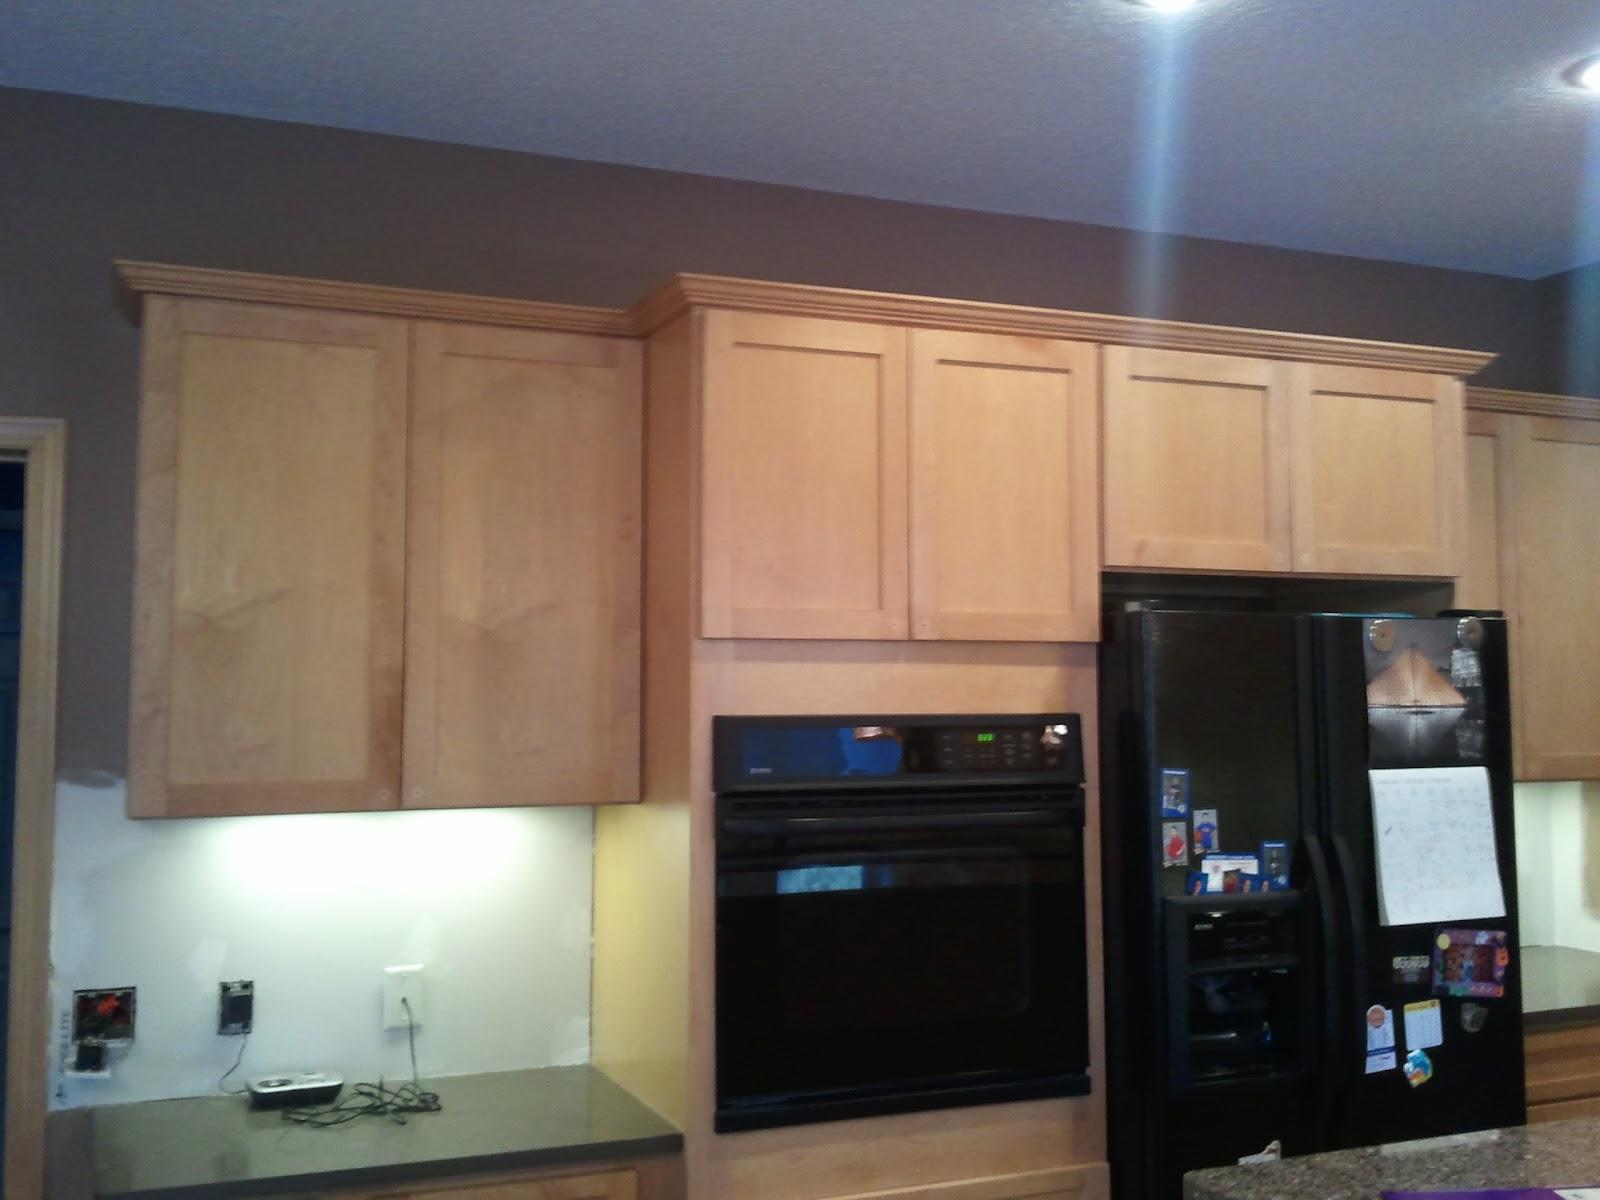 Epoxy Cabinet Paint Signet Painting Wall Finishes Cabinet Refinishing Garage